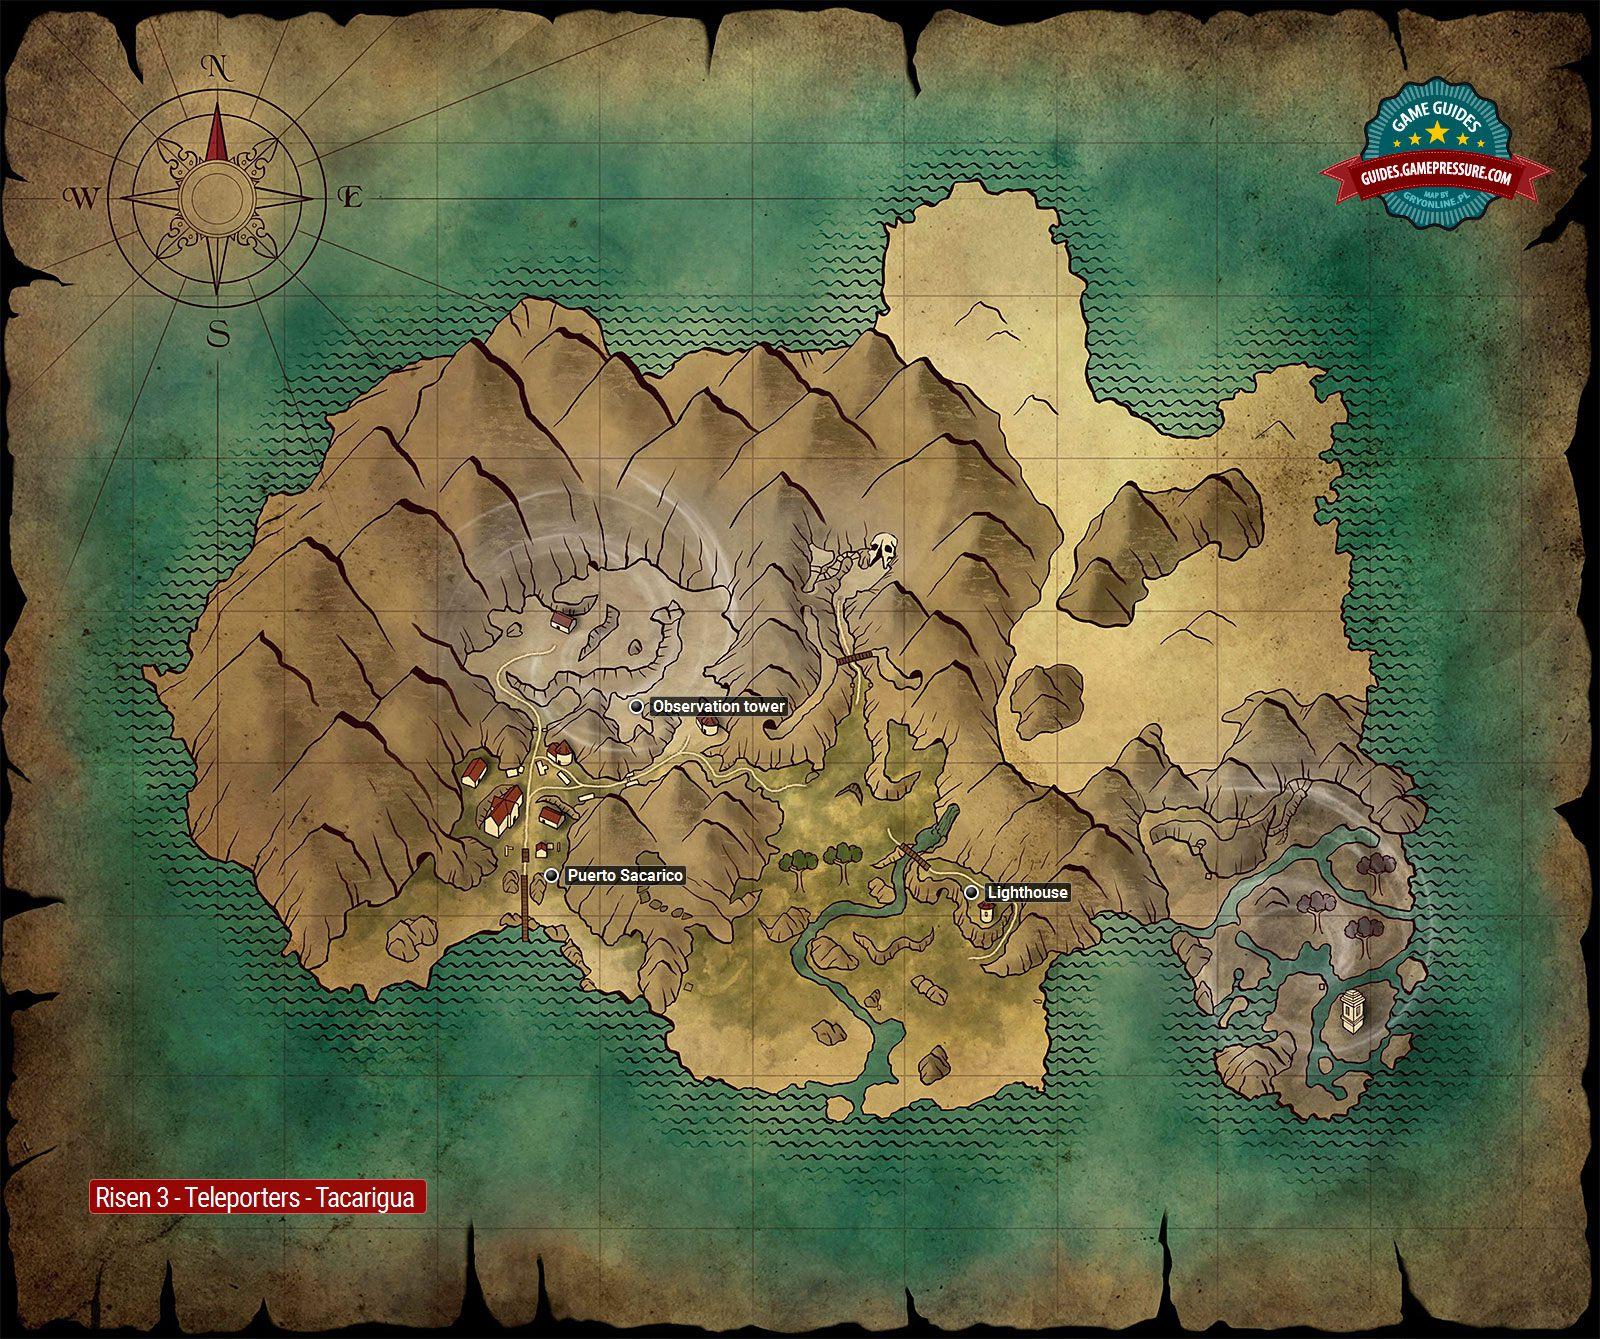 Tacarigua | Teleporters - Risen 3: Titan Lords Game Guide